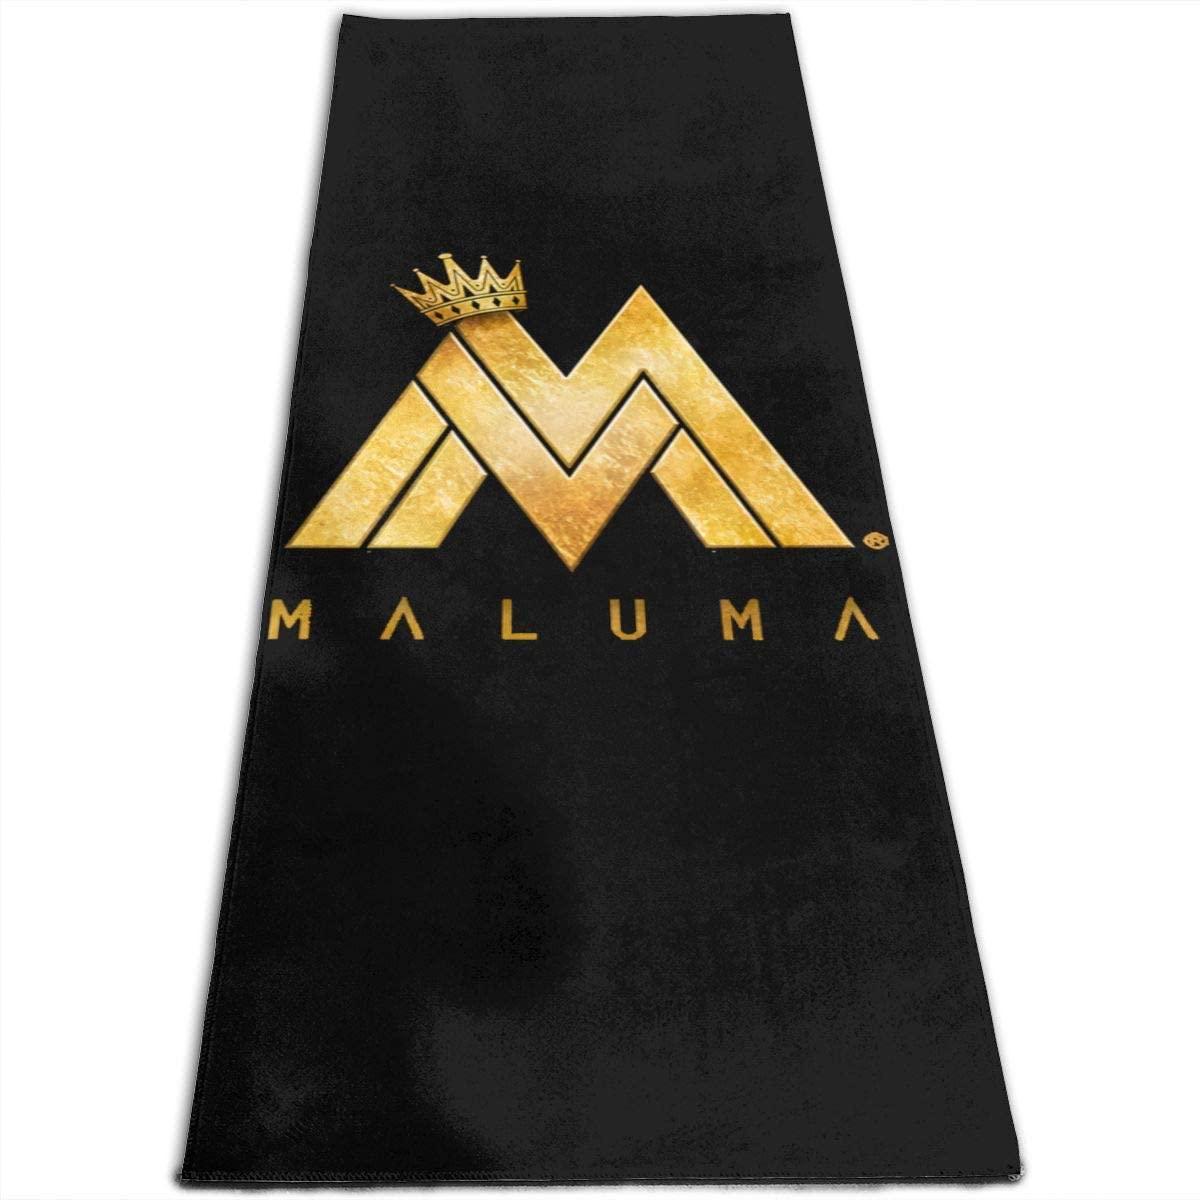 Maluma Yoga Mat Non-Slip Fitness Pad Workout Exercise Gym Pad Pilates Accessory Tool